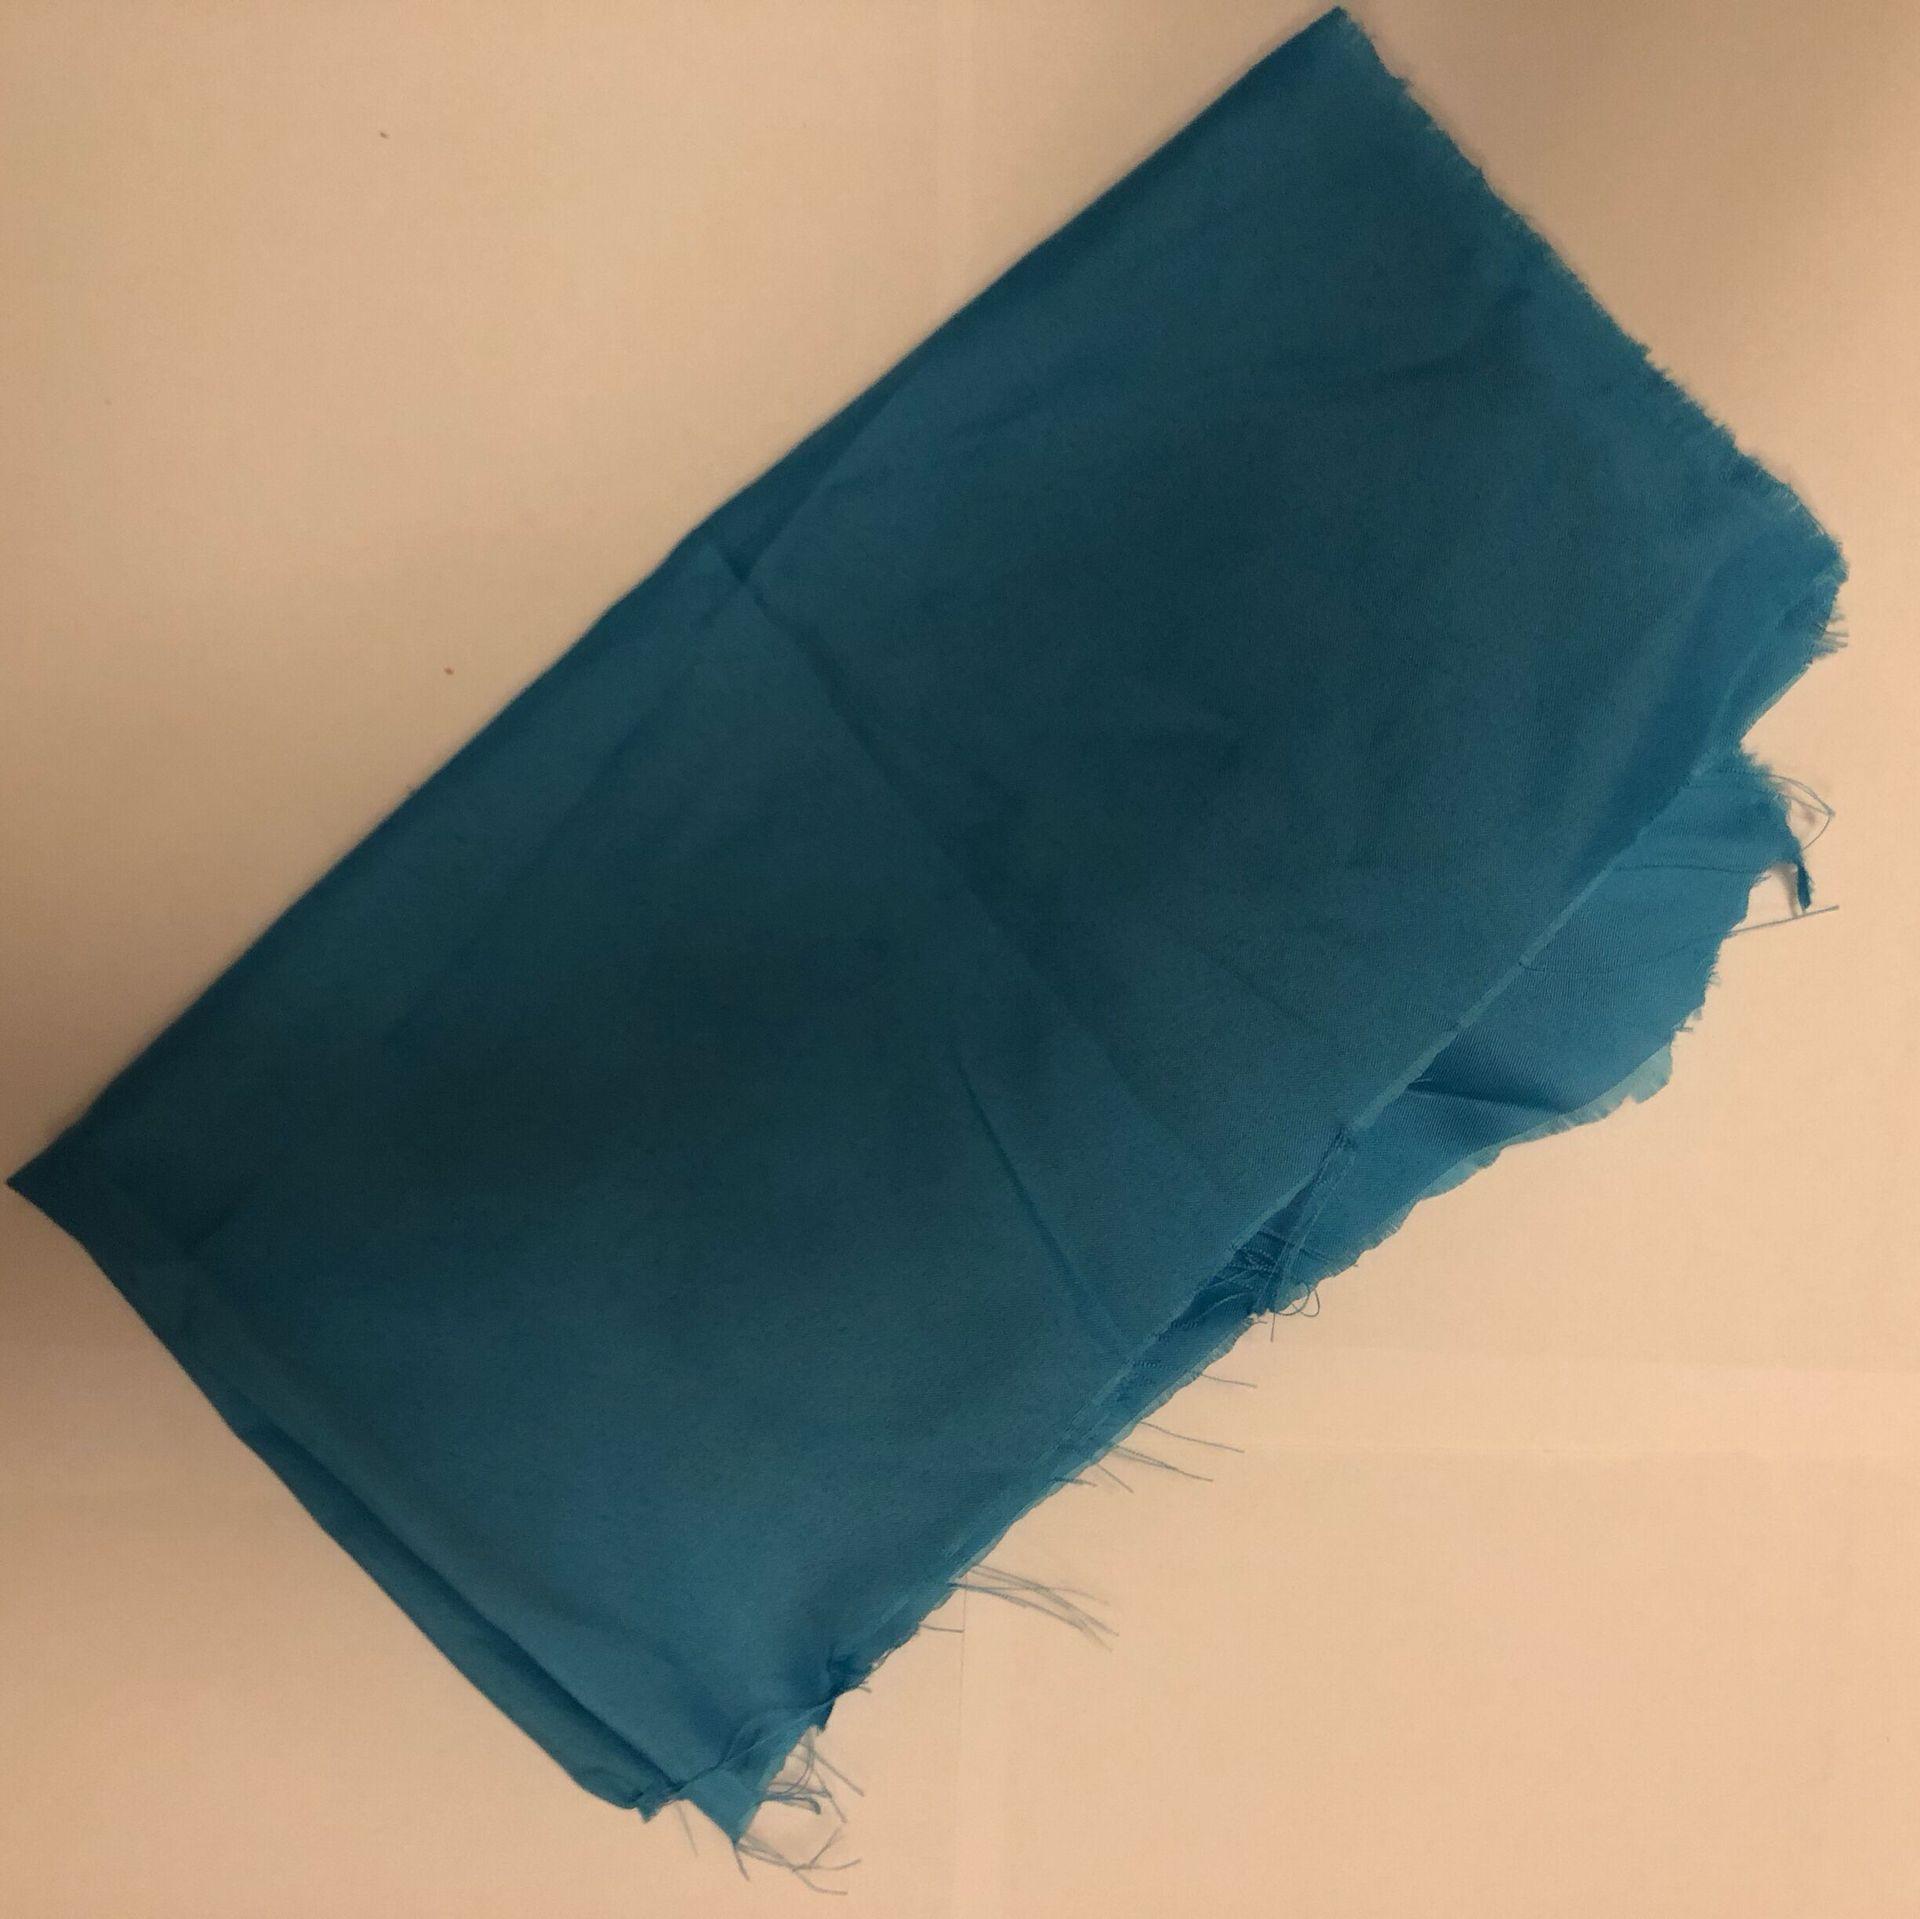 FL 190T pongee chemical fiber grey fabric sofa pillow lining flag cloth pongee grey fabric190T ponge